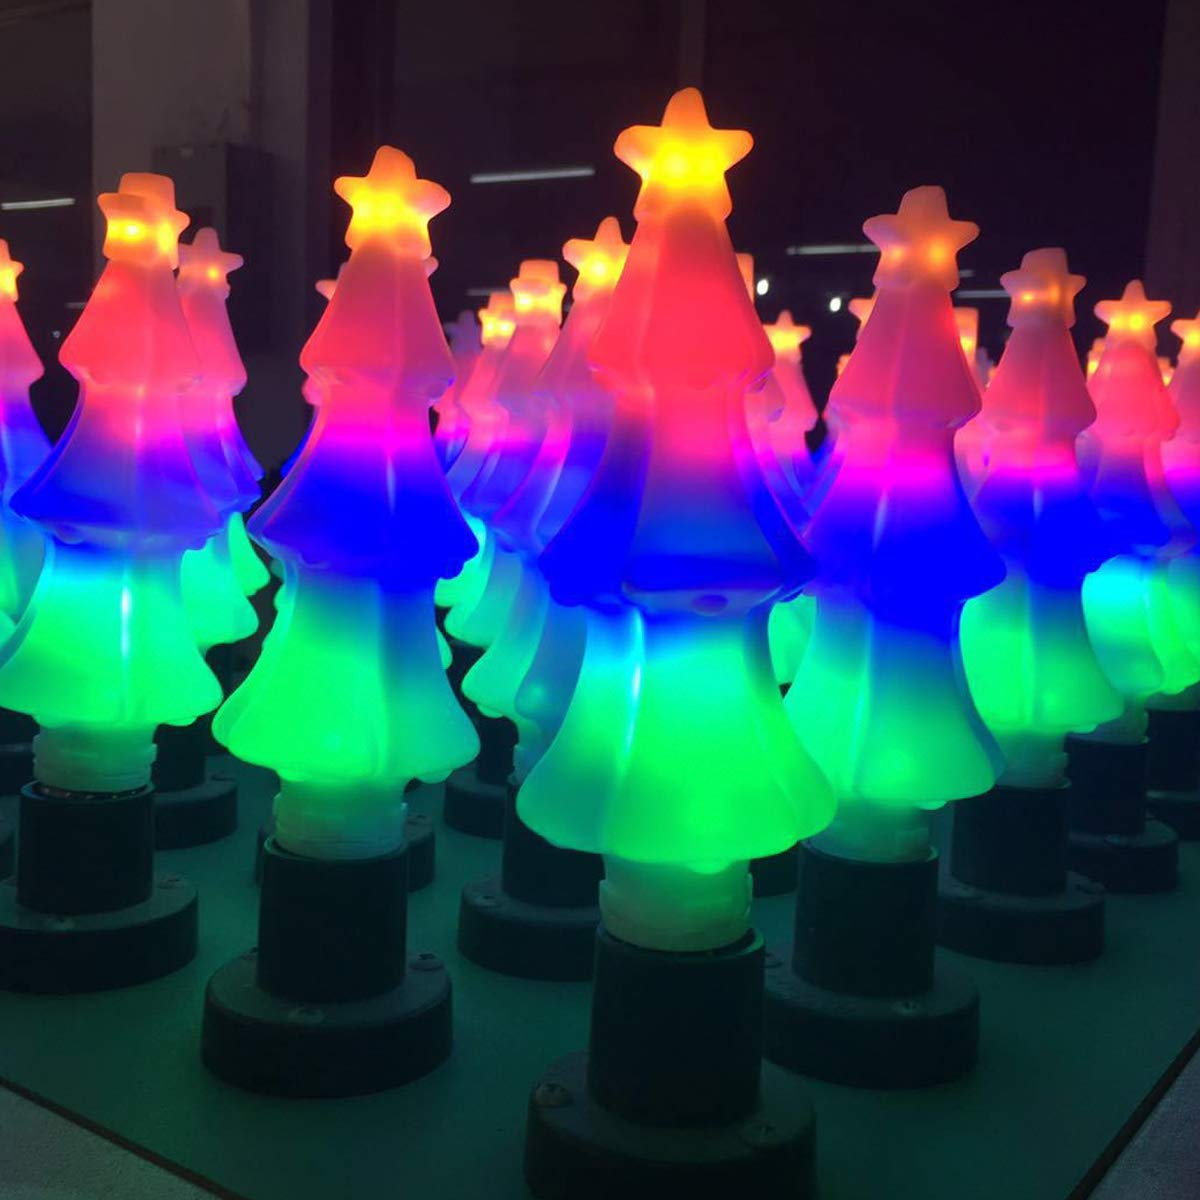 Blue AWE-LIGHT 4-Pack 2W LED Colored Blue Light Bulb G45 E26 Medium Base Color Light Bulb Wedding Halloween Christmas Party Bar Mood Ambiance Decor